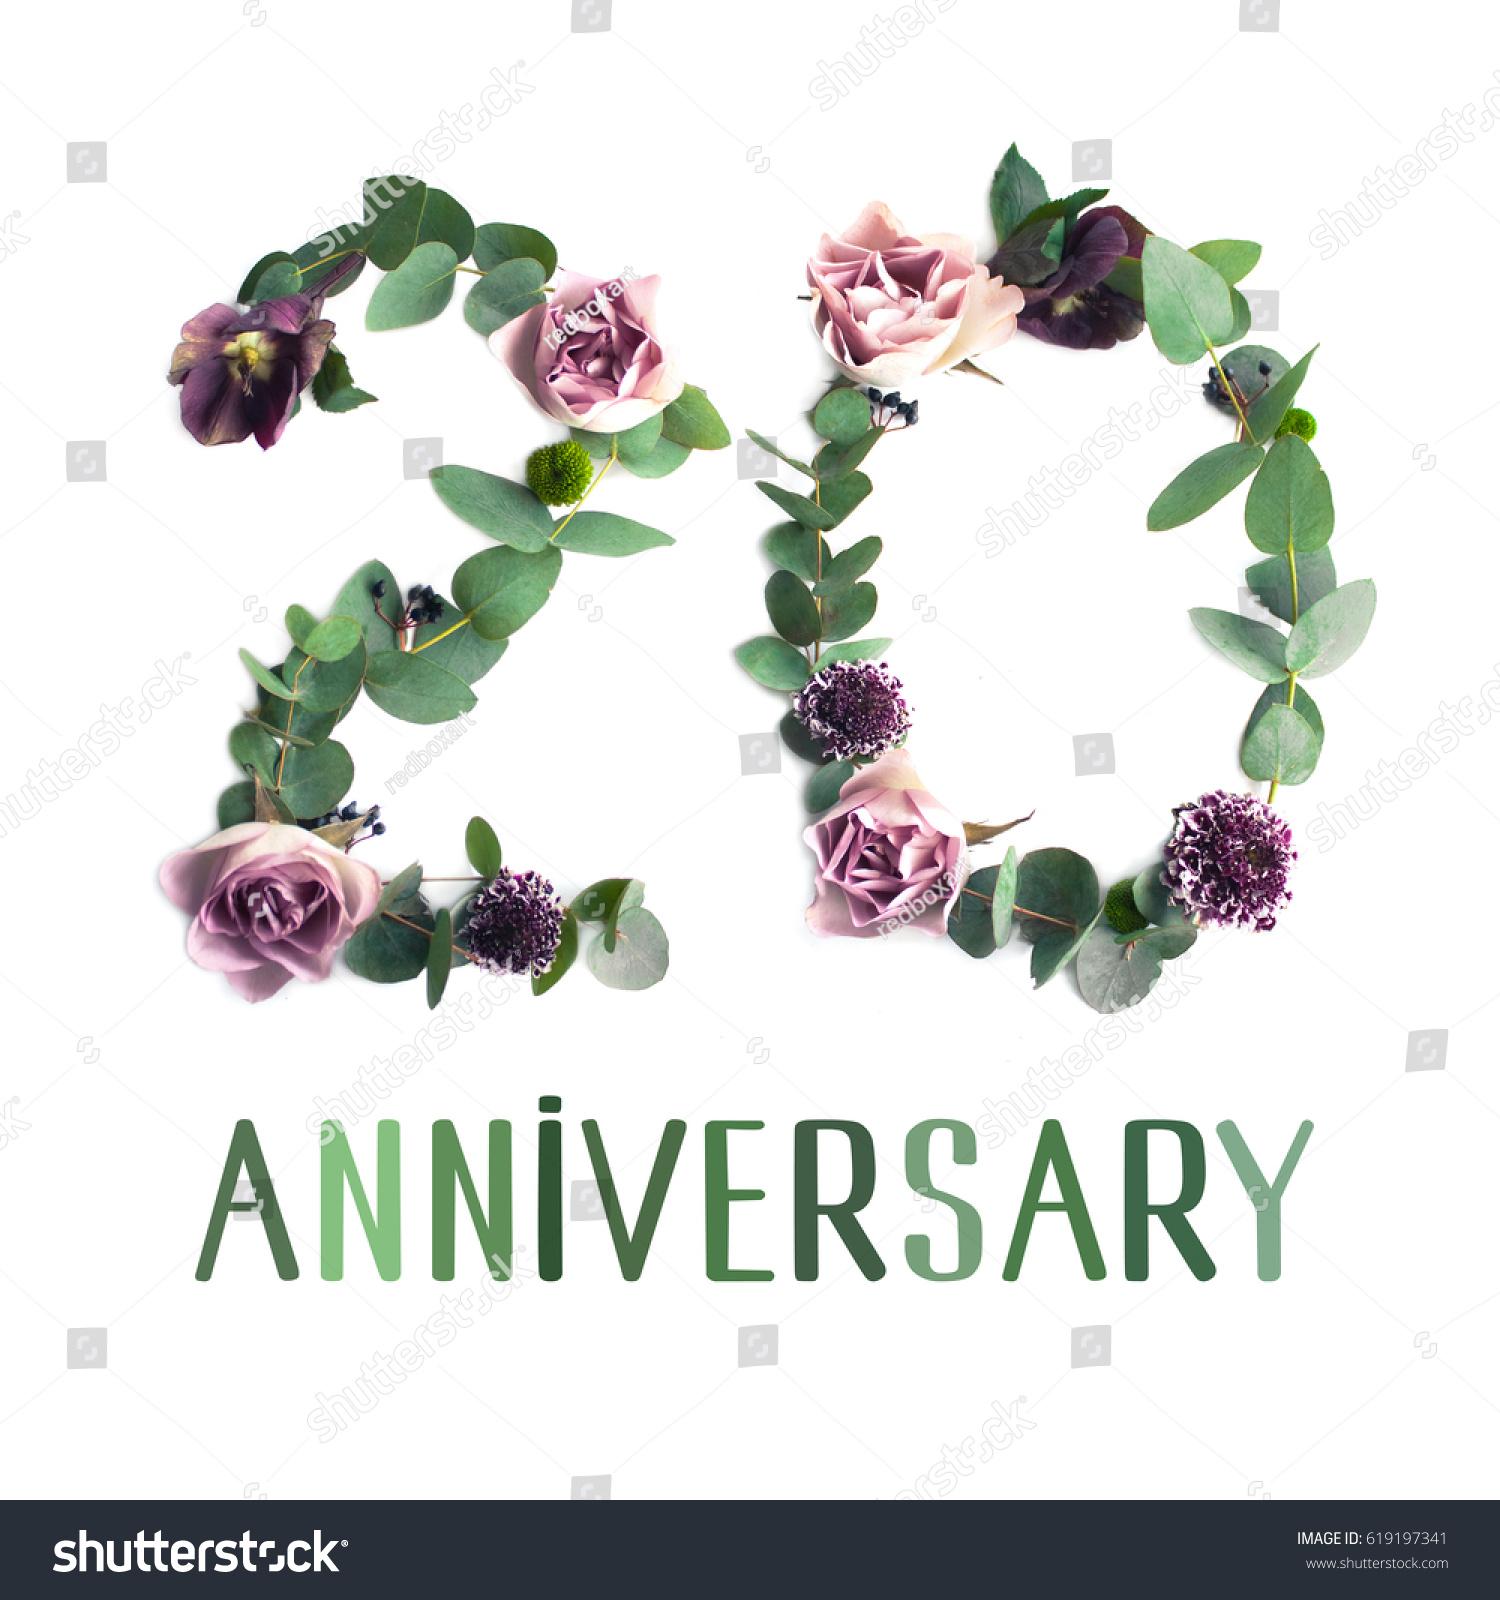 Flowers Number Card Anniversary Invitation Creative Stock Photo ...